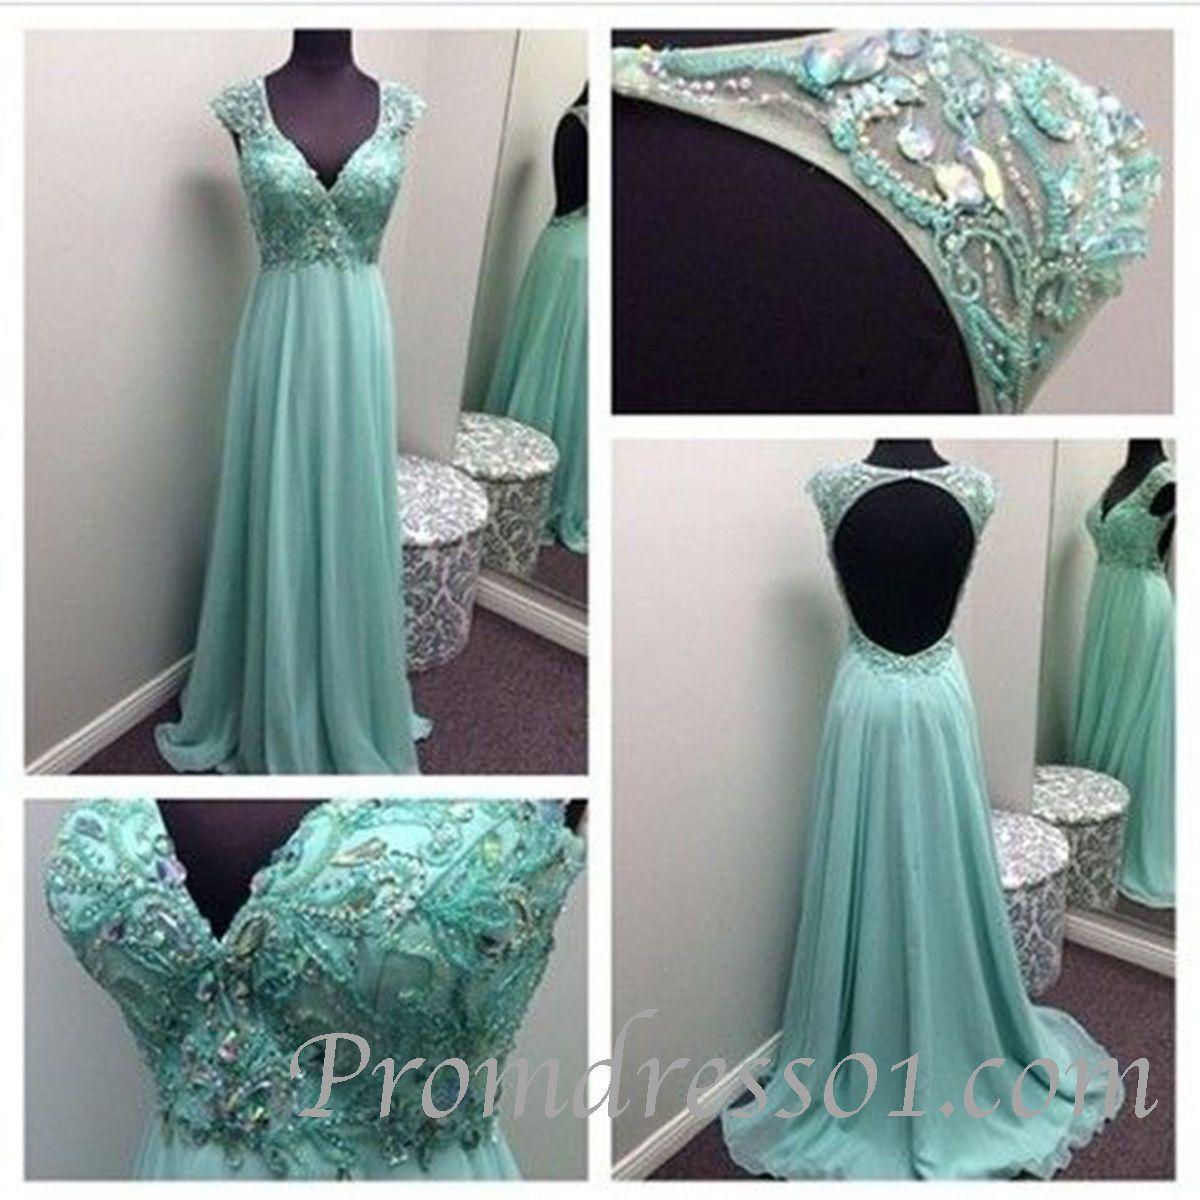 promdress01 prom dresses - 2015 green lace chiffon open back modest ...